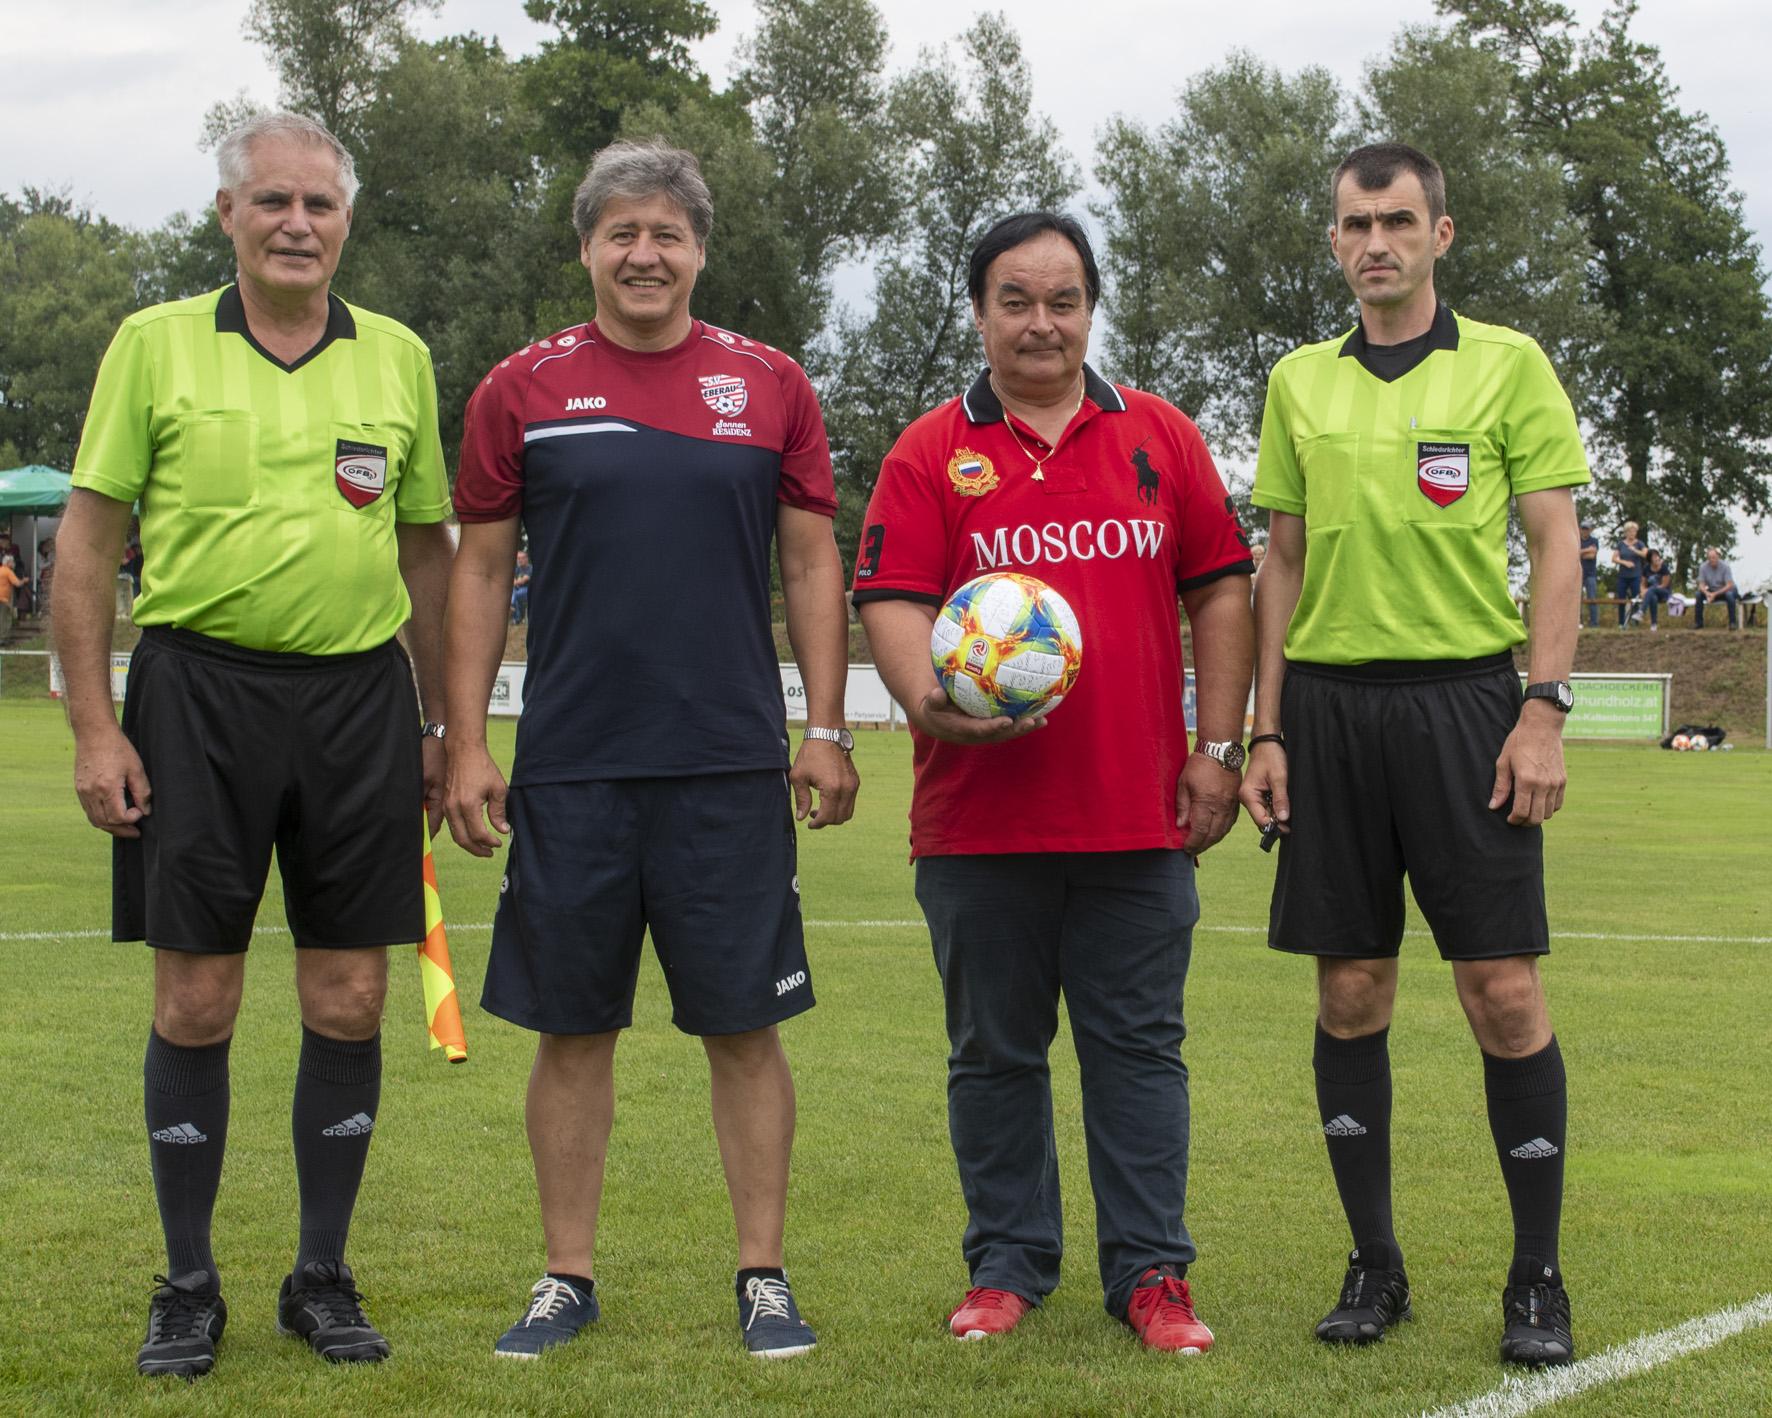 2019_07_28_-_Burgenlandcup_-_SVE_-_SV_Eltendorf_-_Patronanz__Matchball_-_000140